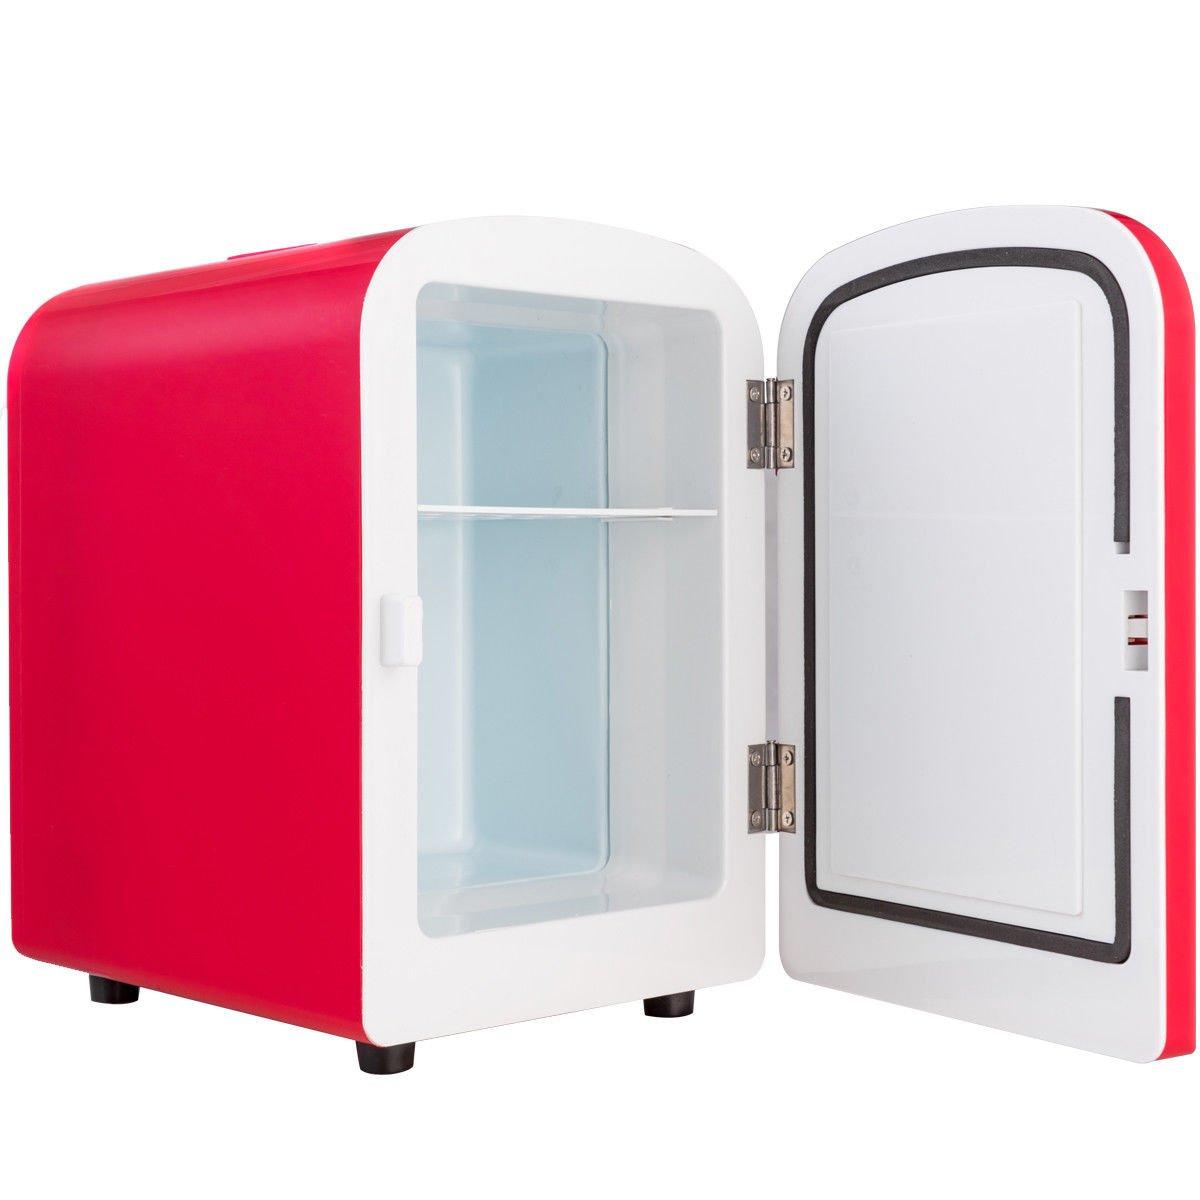 PNPGlobal Mini Fridge Portable Cooler Warmer Heats 4L Auto Car Boat Home Office Red New